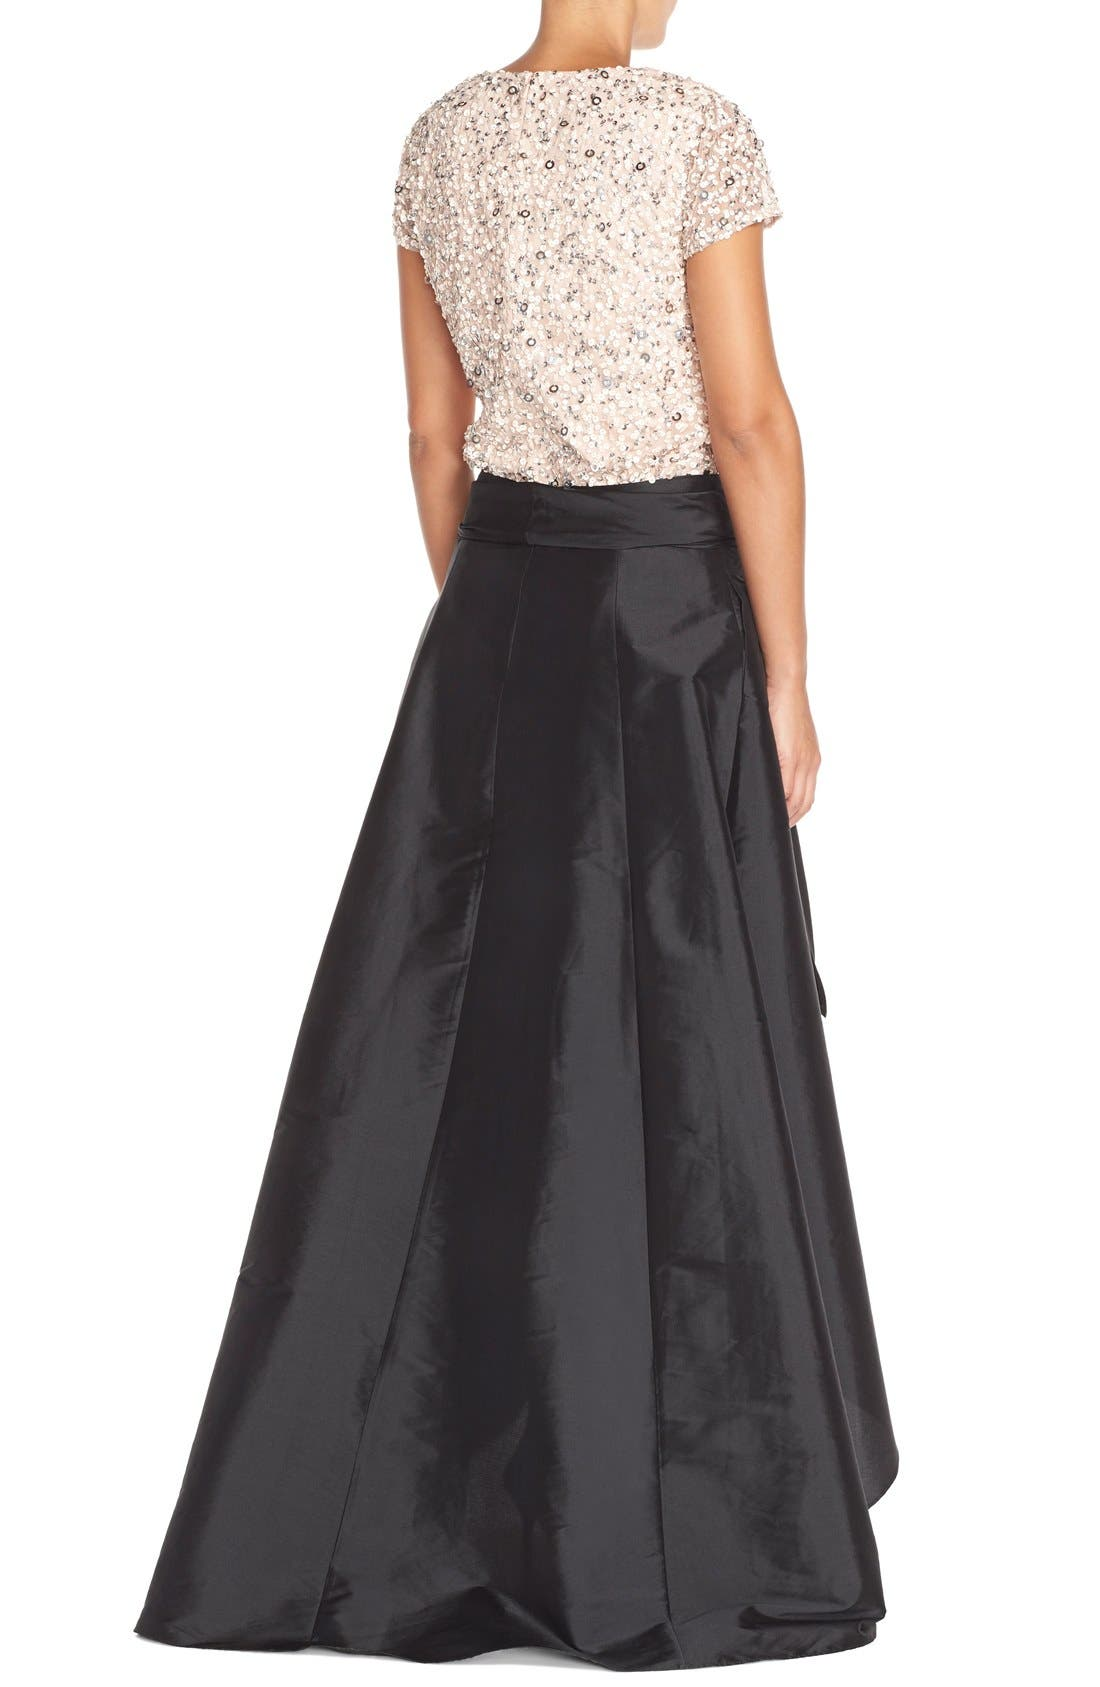 ADRIANNA PAPELL, High/Low Taffeta Ball Skirt, Alternate thumbnail 5, color, 001